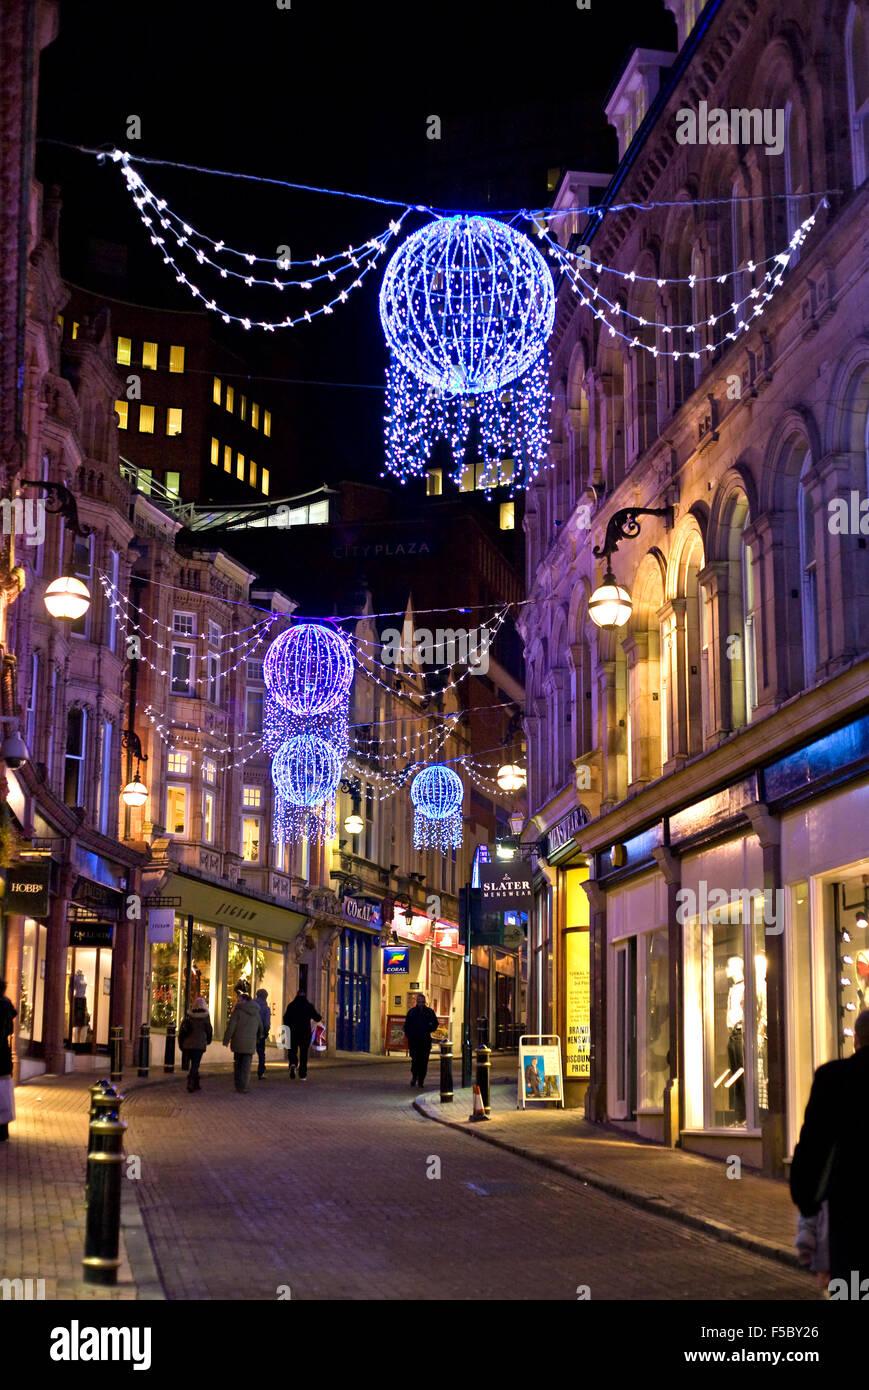 Birmingham Christmas Lights.Christmas Lights In Birmingham Stock Photos Christmas